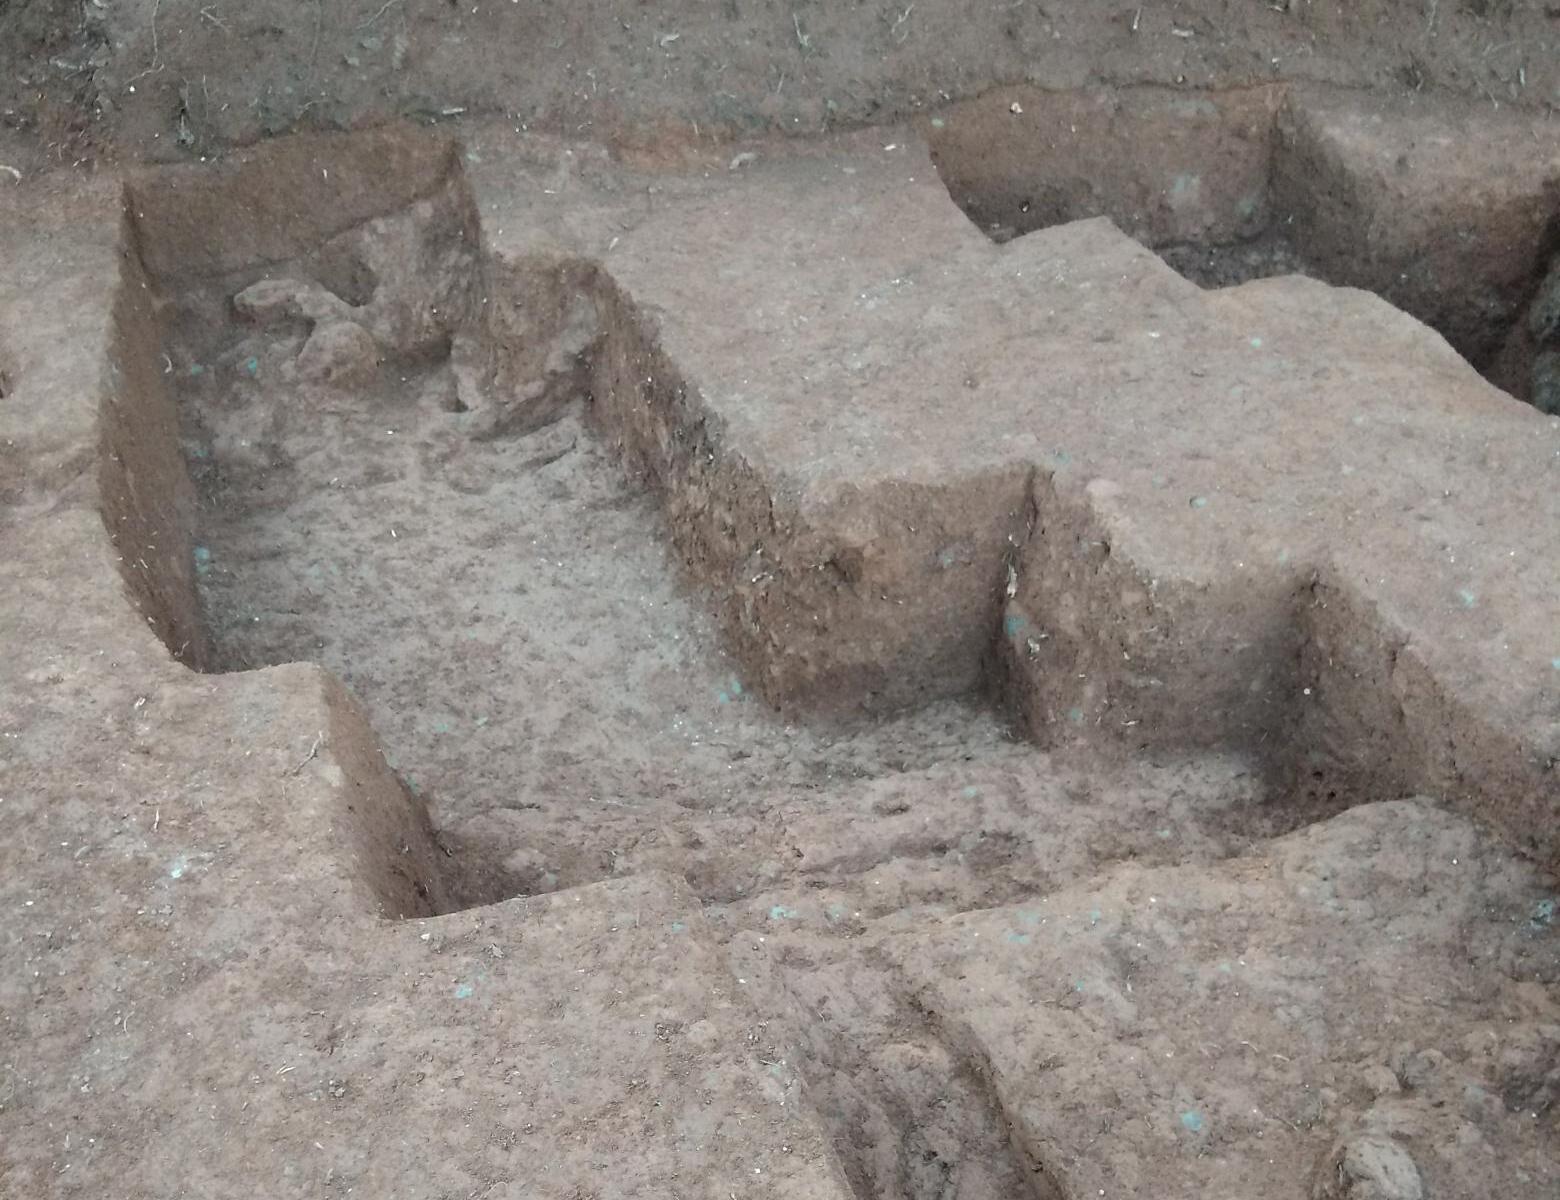 Scavi archeologici nell'area di Tormarancia